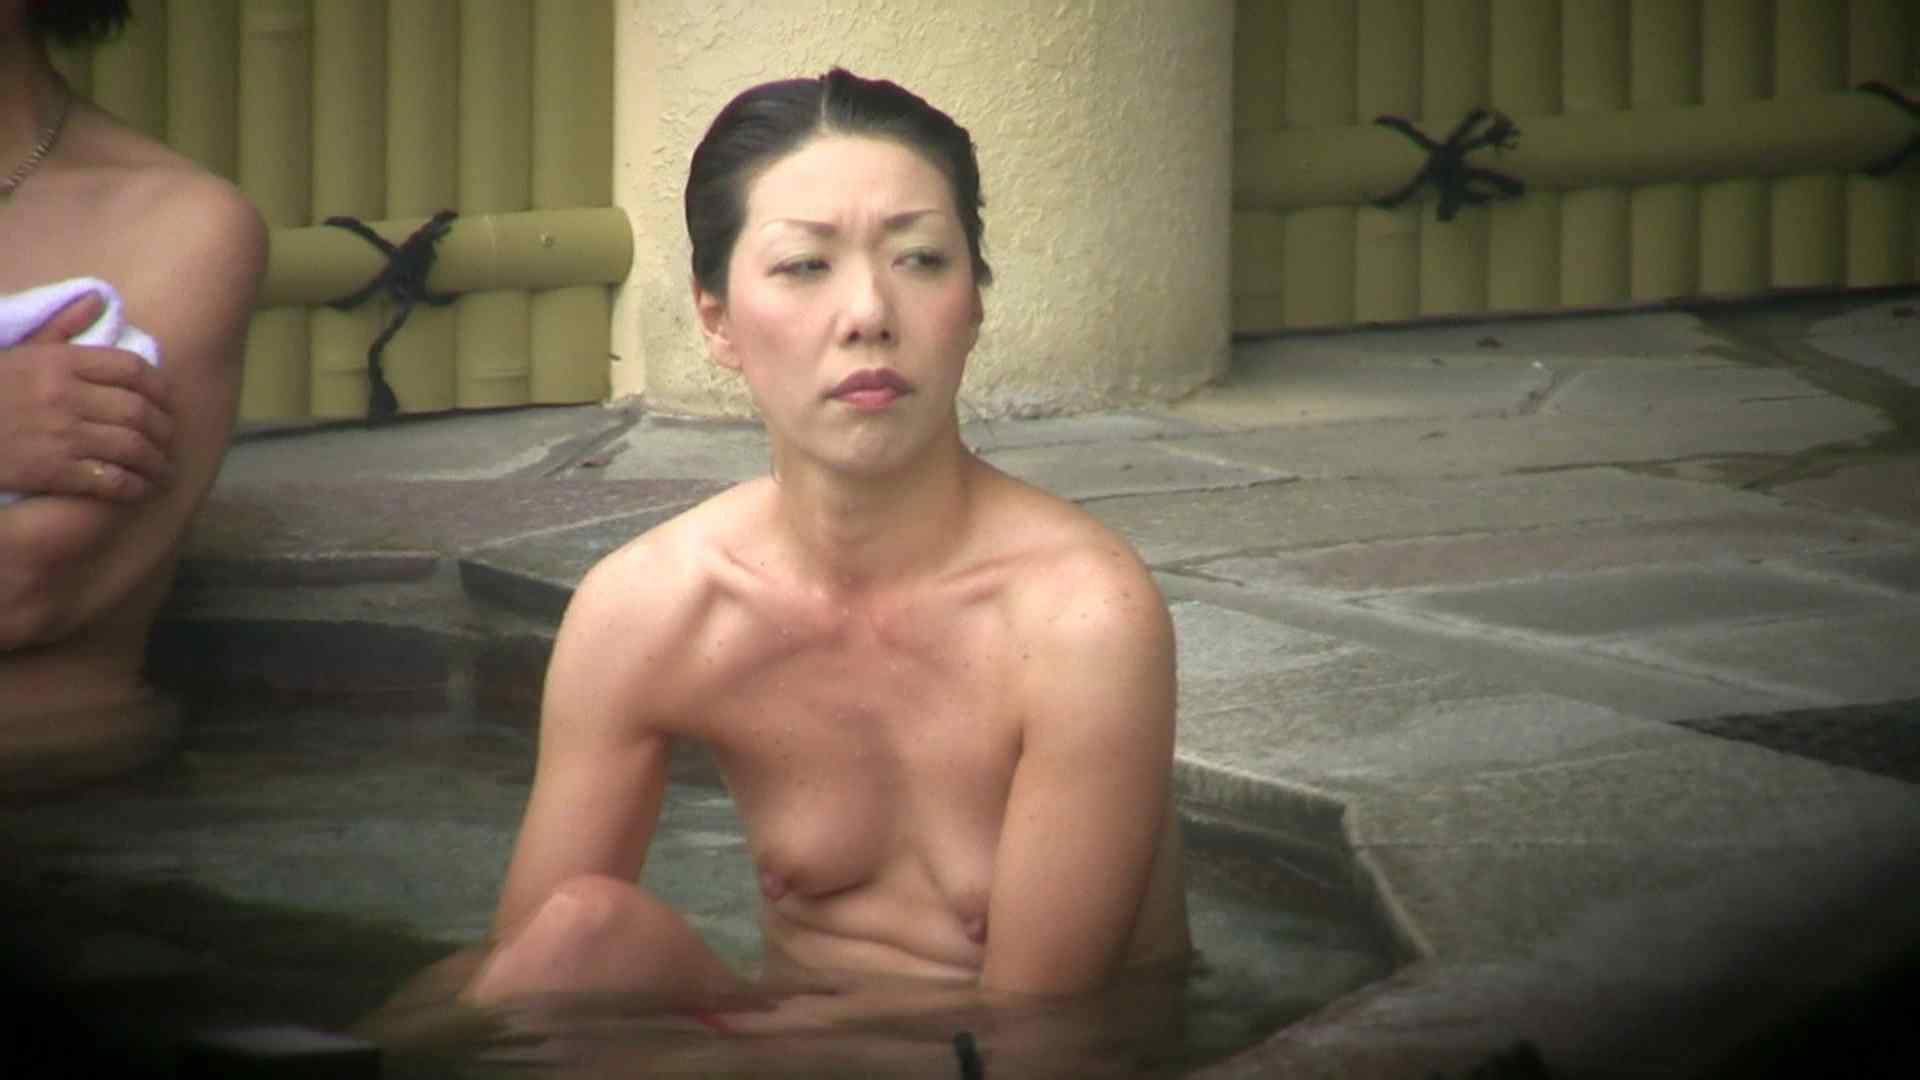 高画質露天女風呂観察 vol.036 OLセックス | 乙女  96画像 36